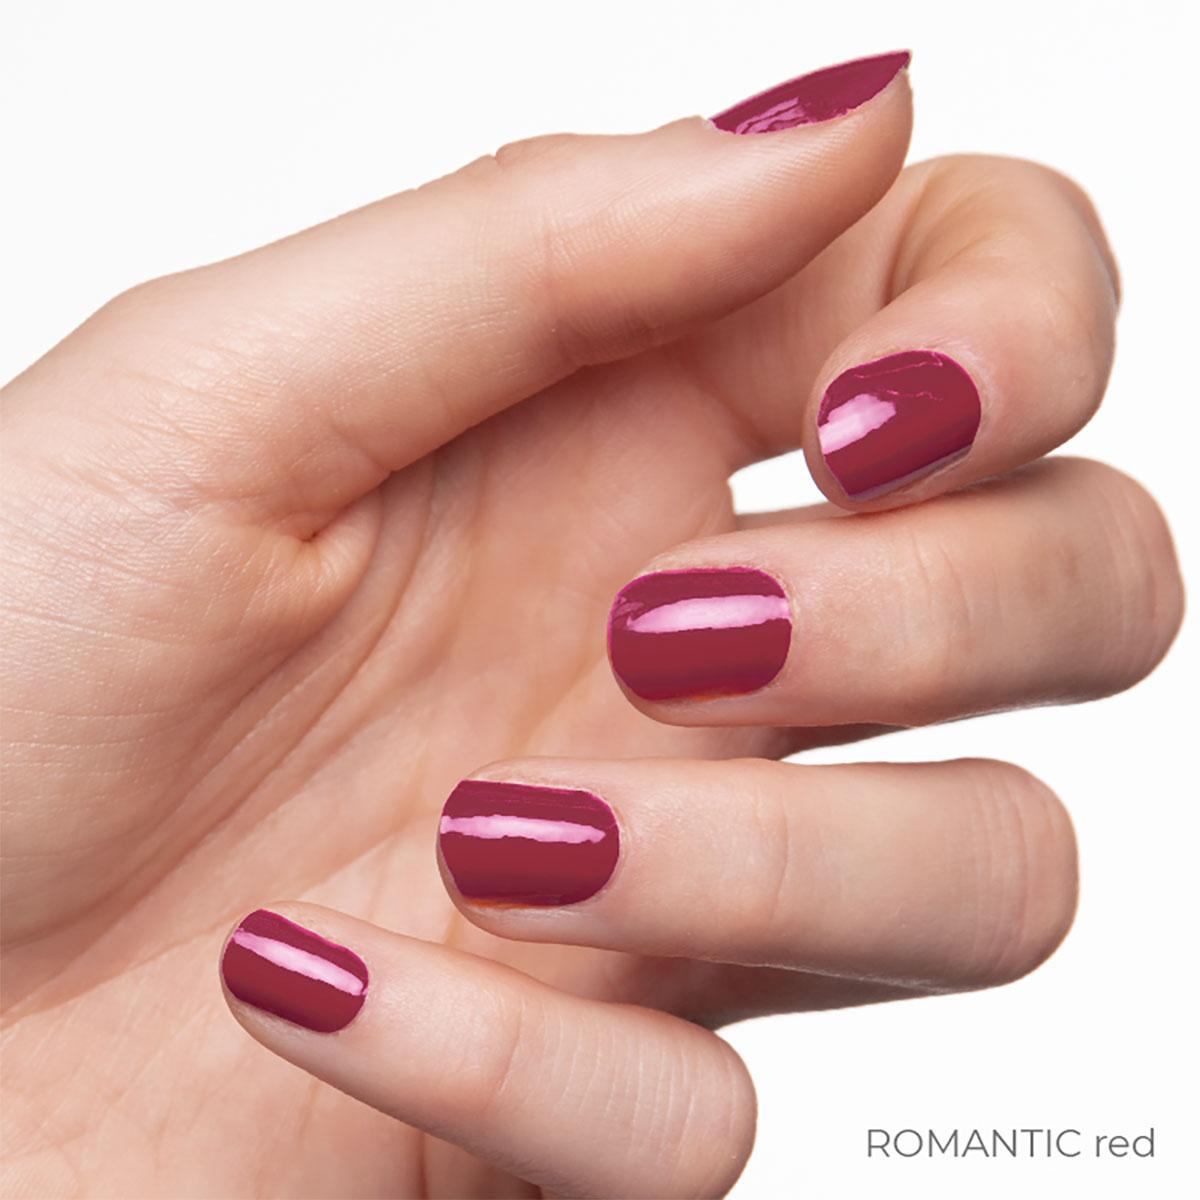 Hand_ROMANTIC_red